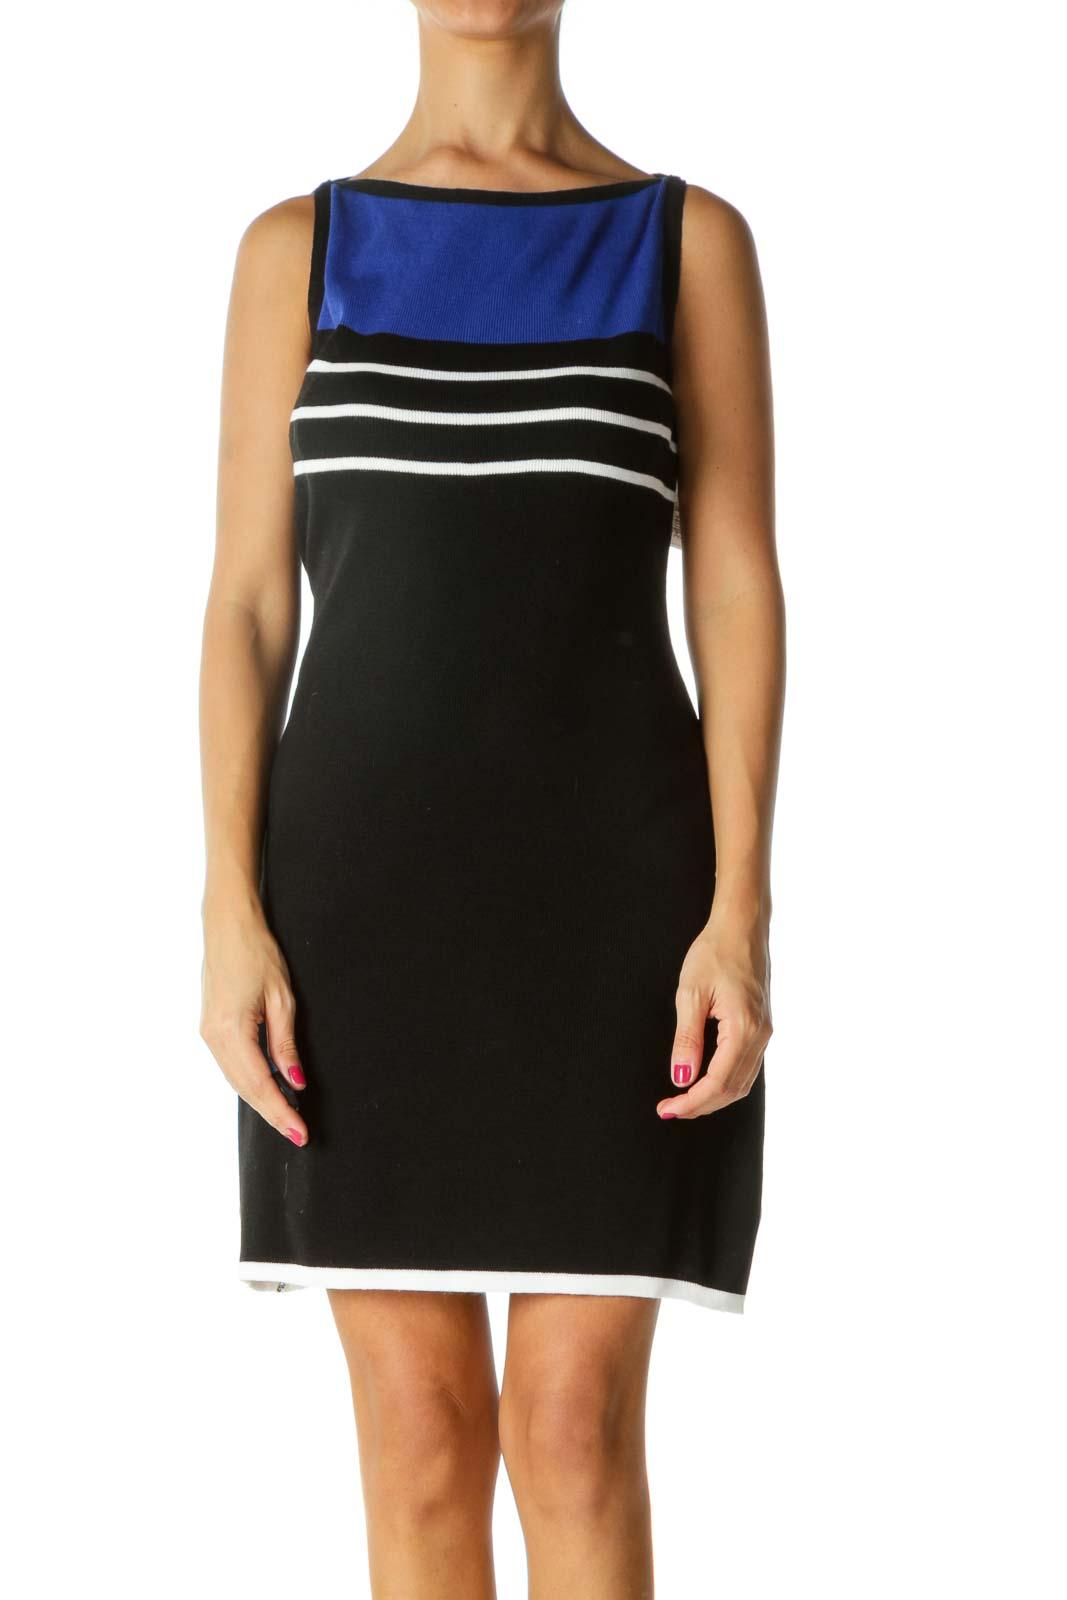 Blue Black White Boat Neck Striped Knit Dress Front